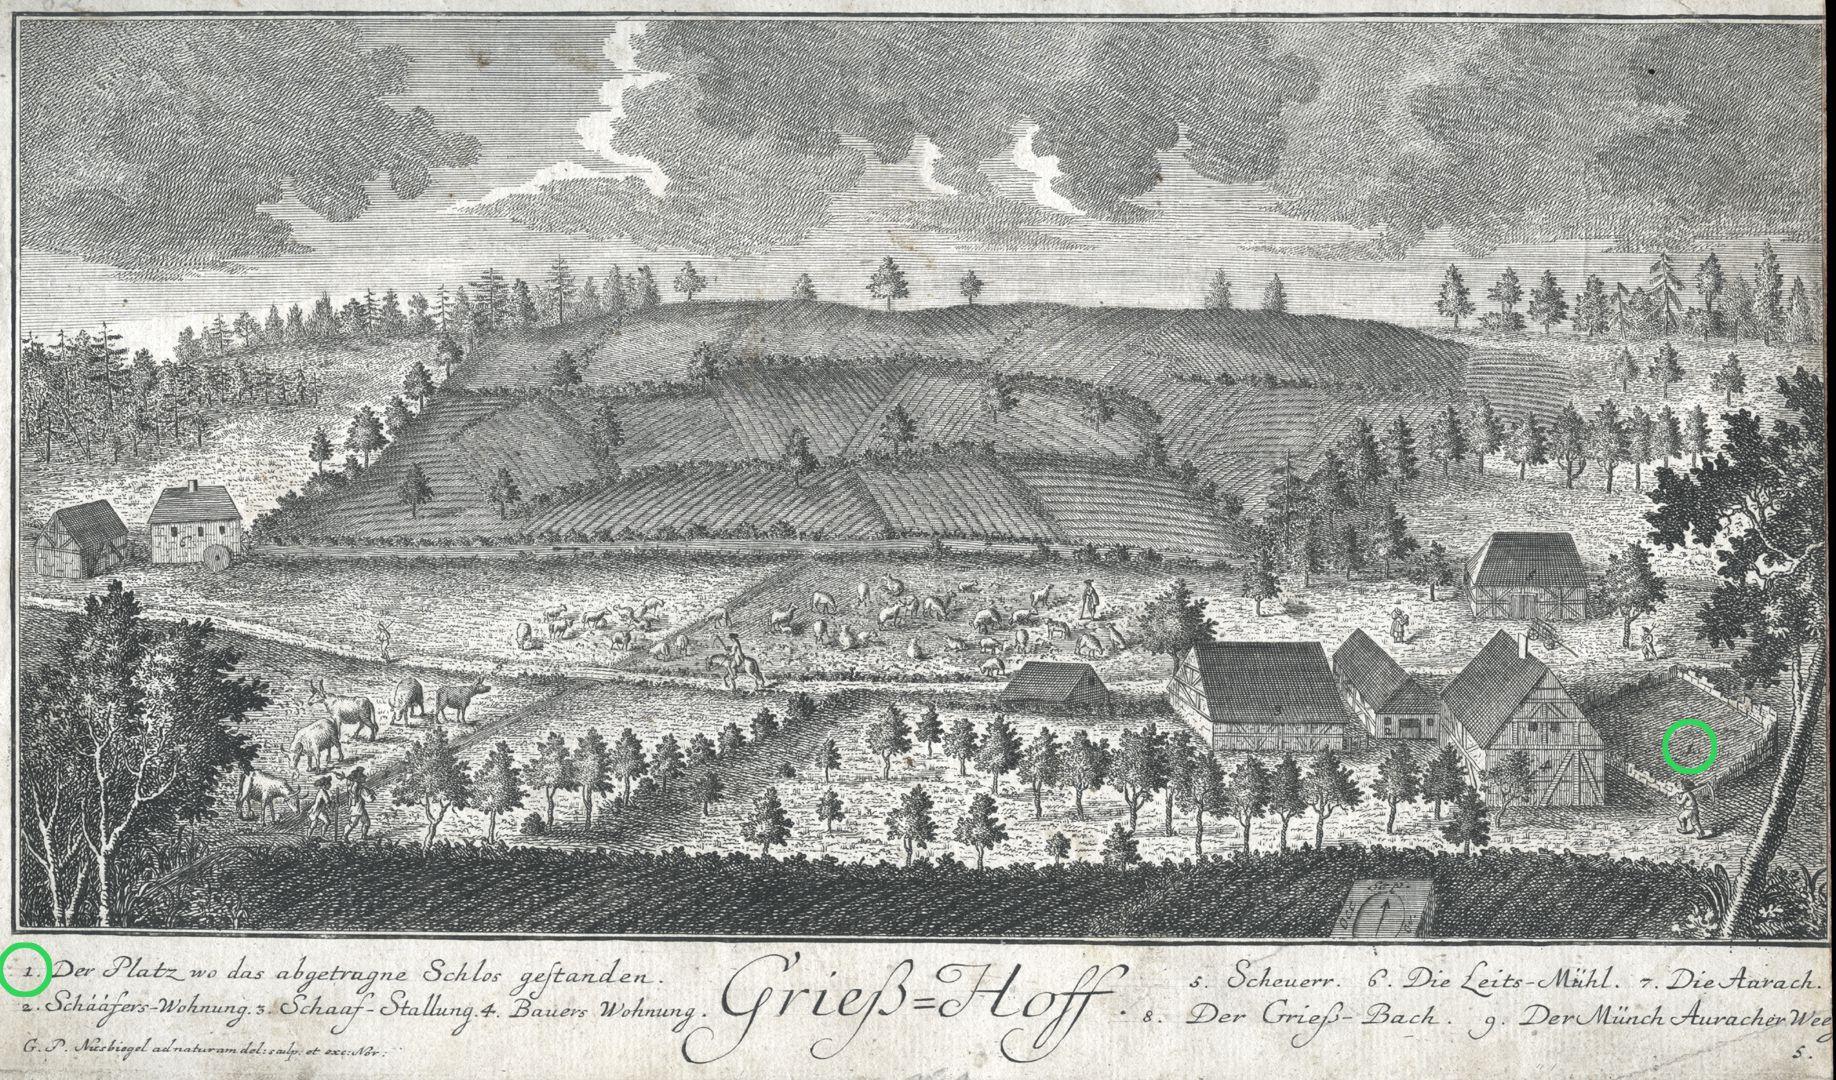 Grieß=Hoff  (Griess farm) Place where the demolished palace stood